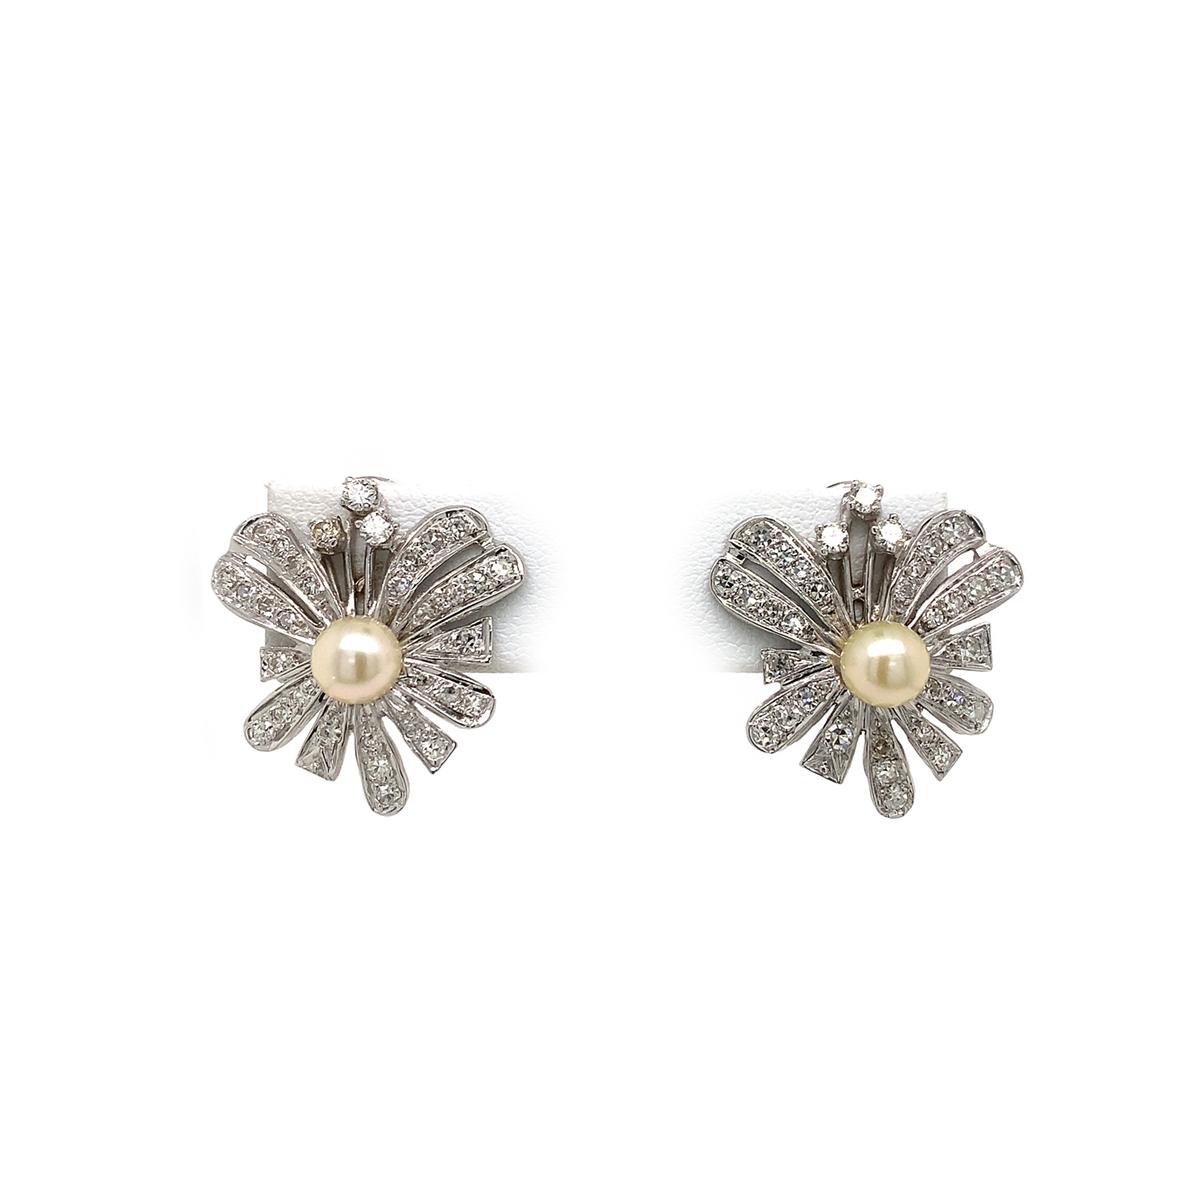 Vintage 14 Karat White Gold Pearl and Diamond Spray Earrings